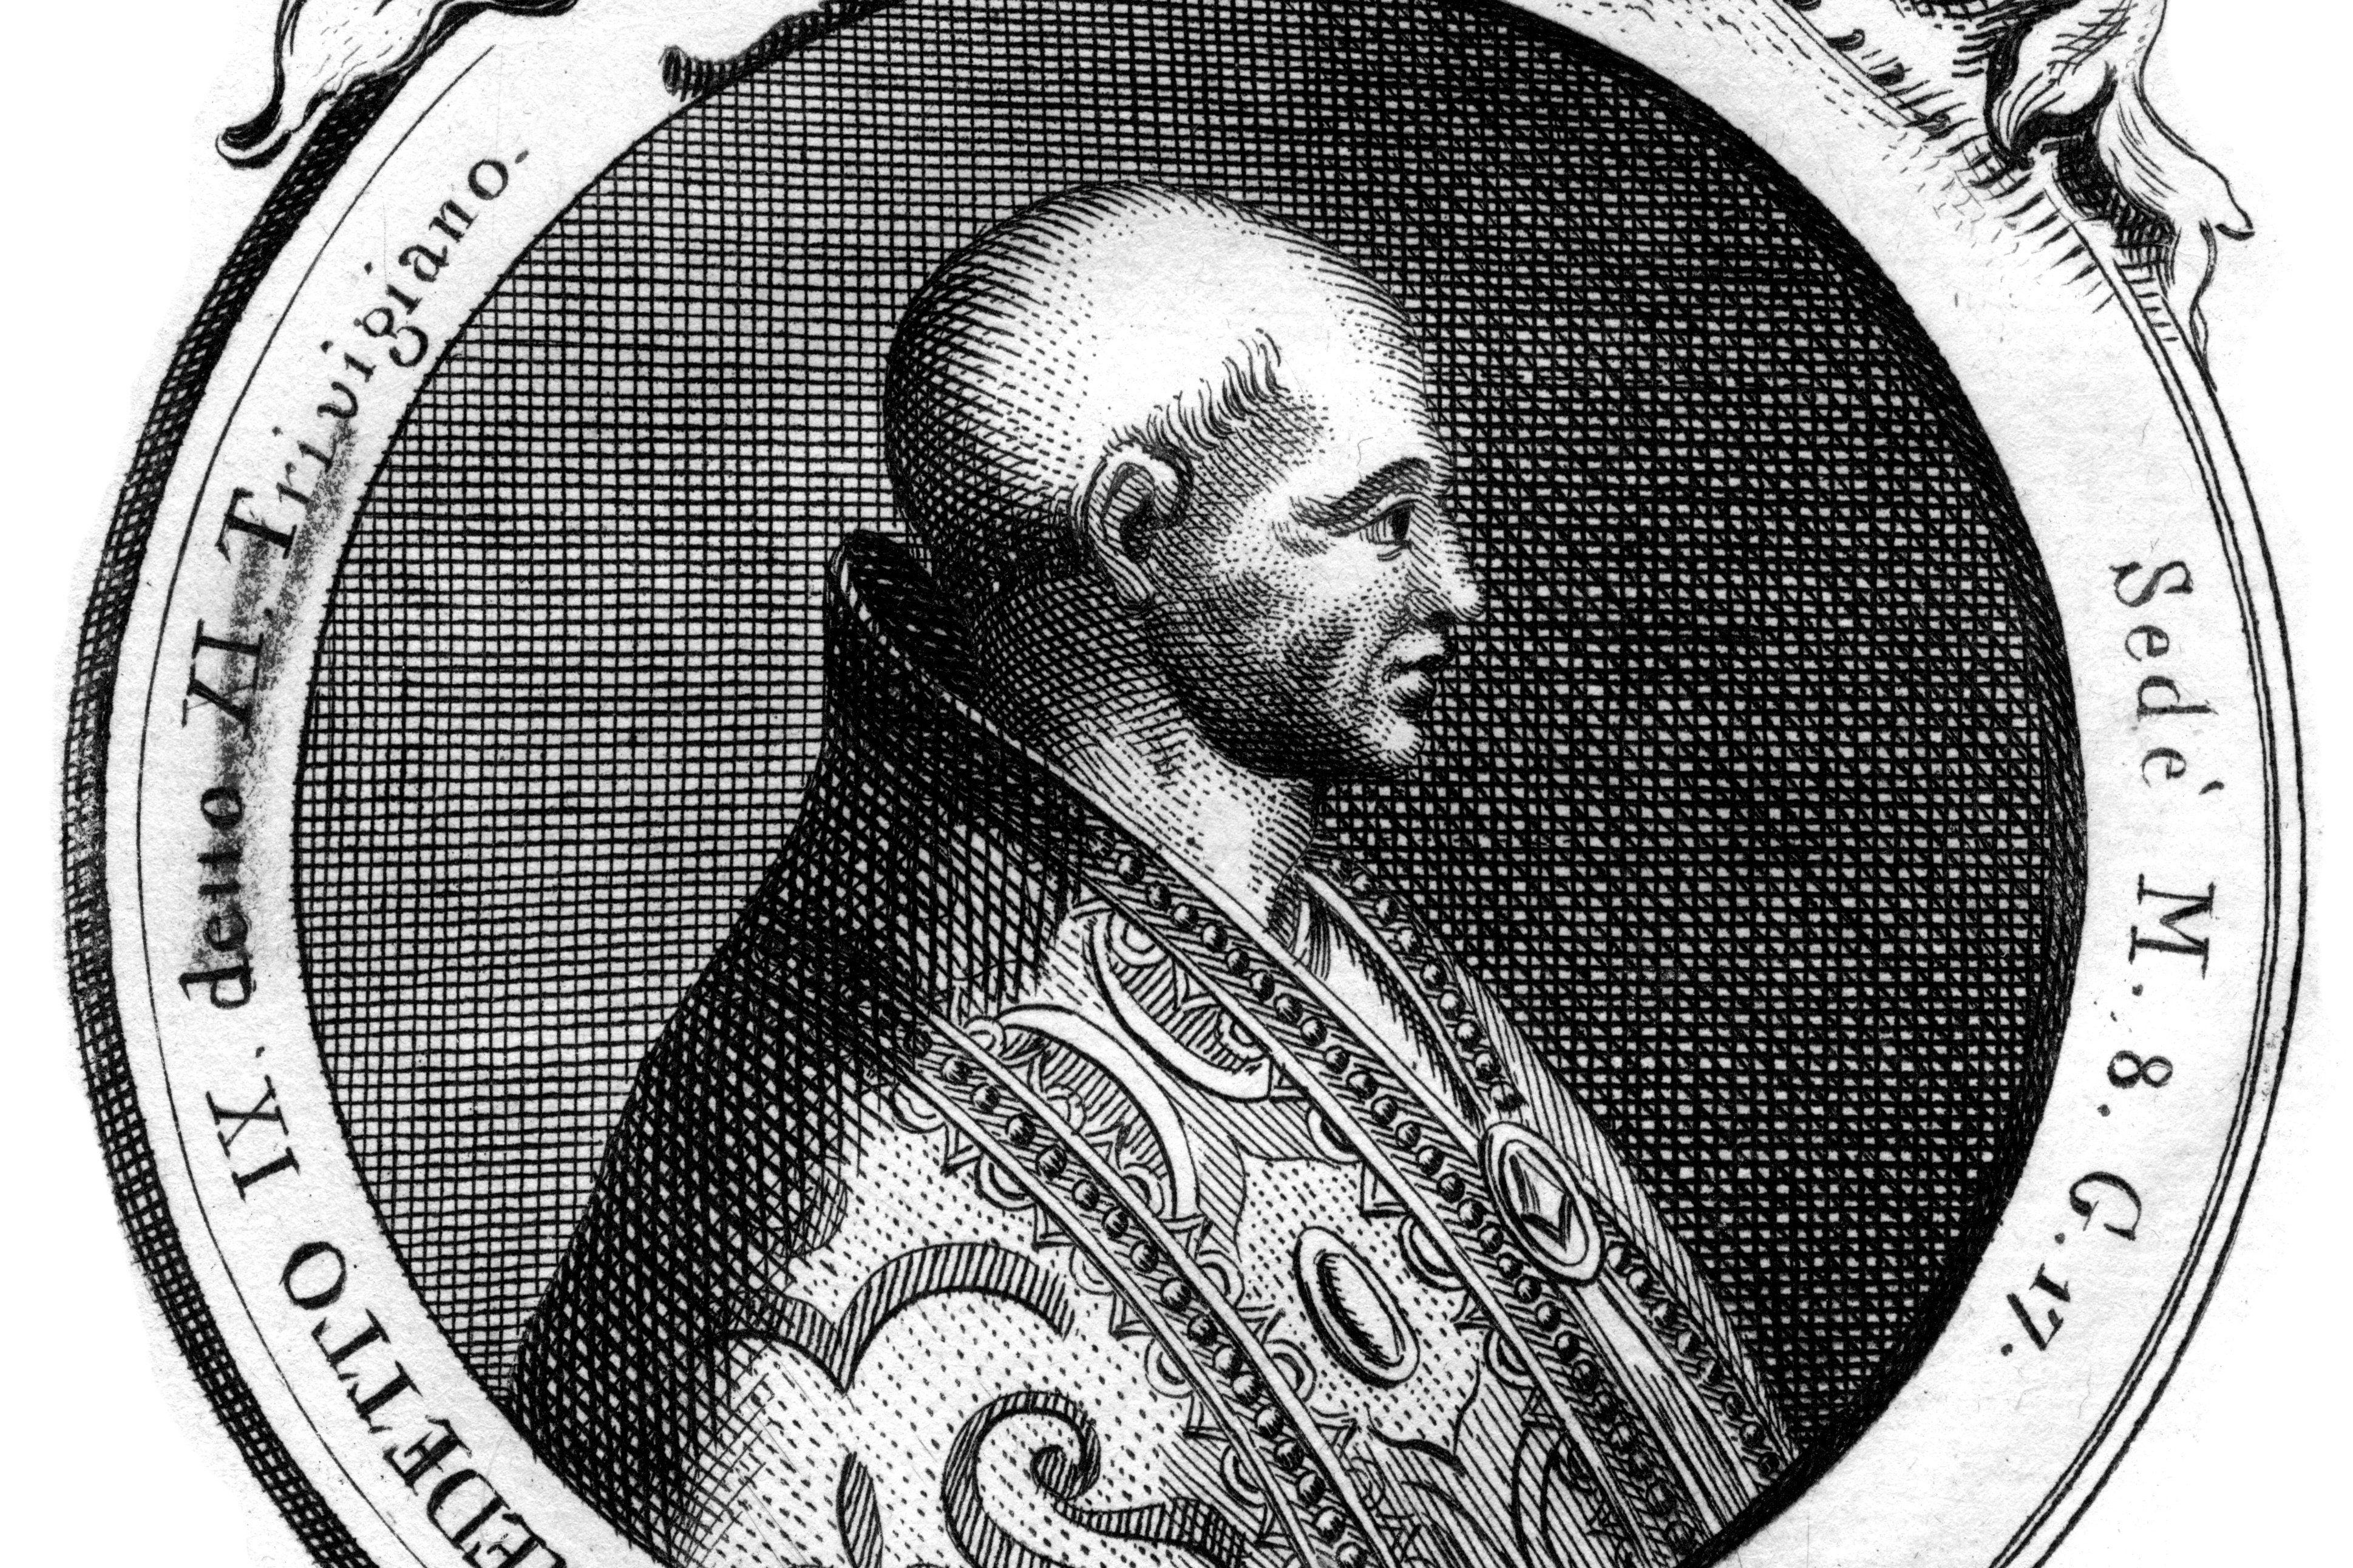 Benedict IX, Πάπας της Καθολικής Εκκλησίας.